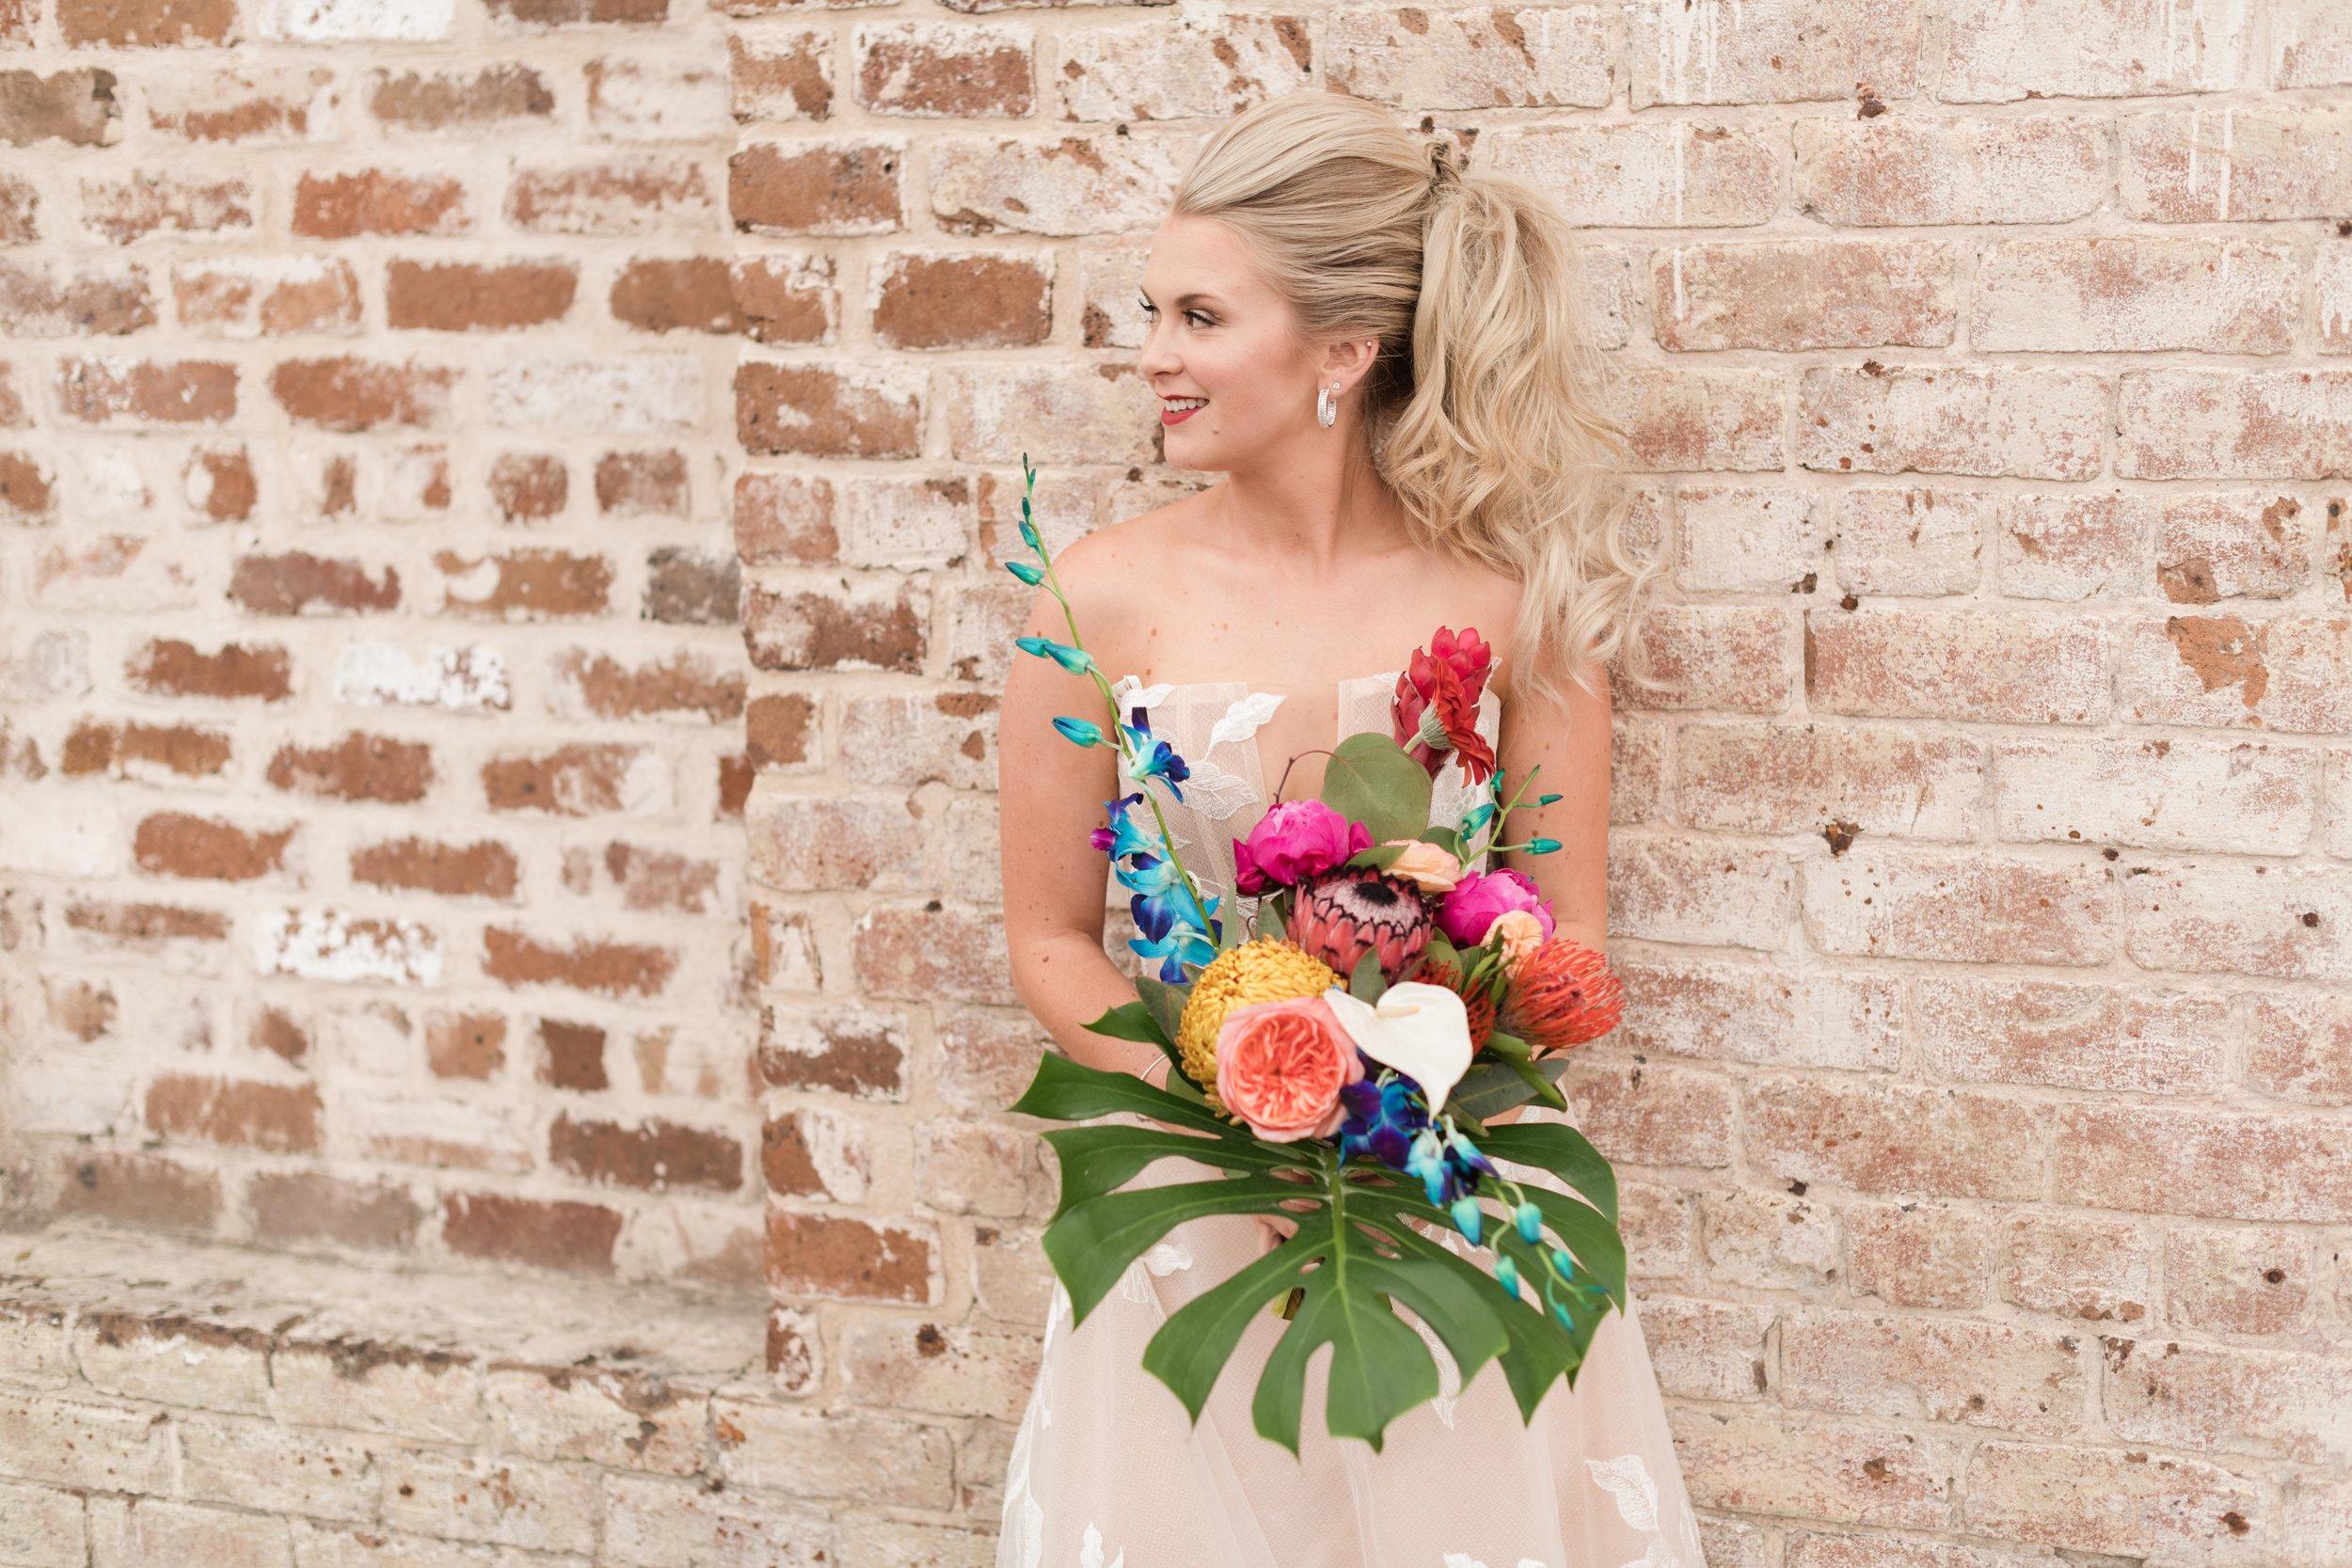 savannah-carnaval-wedding-inspiration-tropical-wedding-florist-tropical-wedding-inspiration-savannah-weddings-the-clyde-tropical-wedding-flowers-savannah-bridal-shop-savannah-wedding-dresses-willowby-by-rai-layla-ivory-and-beau.jpg